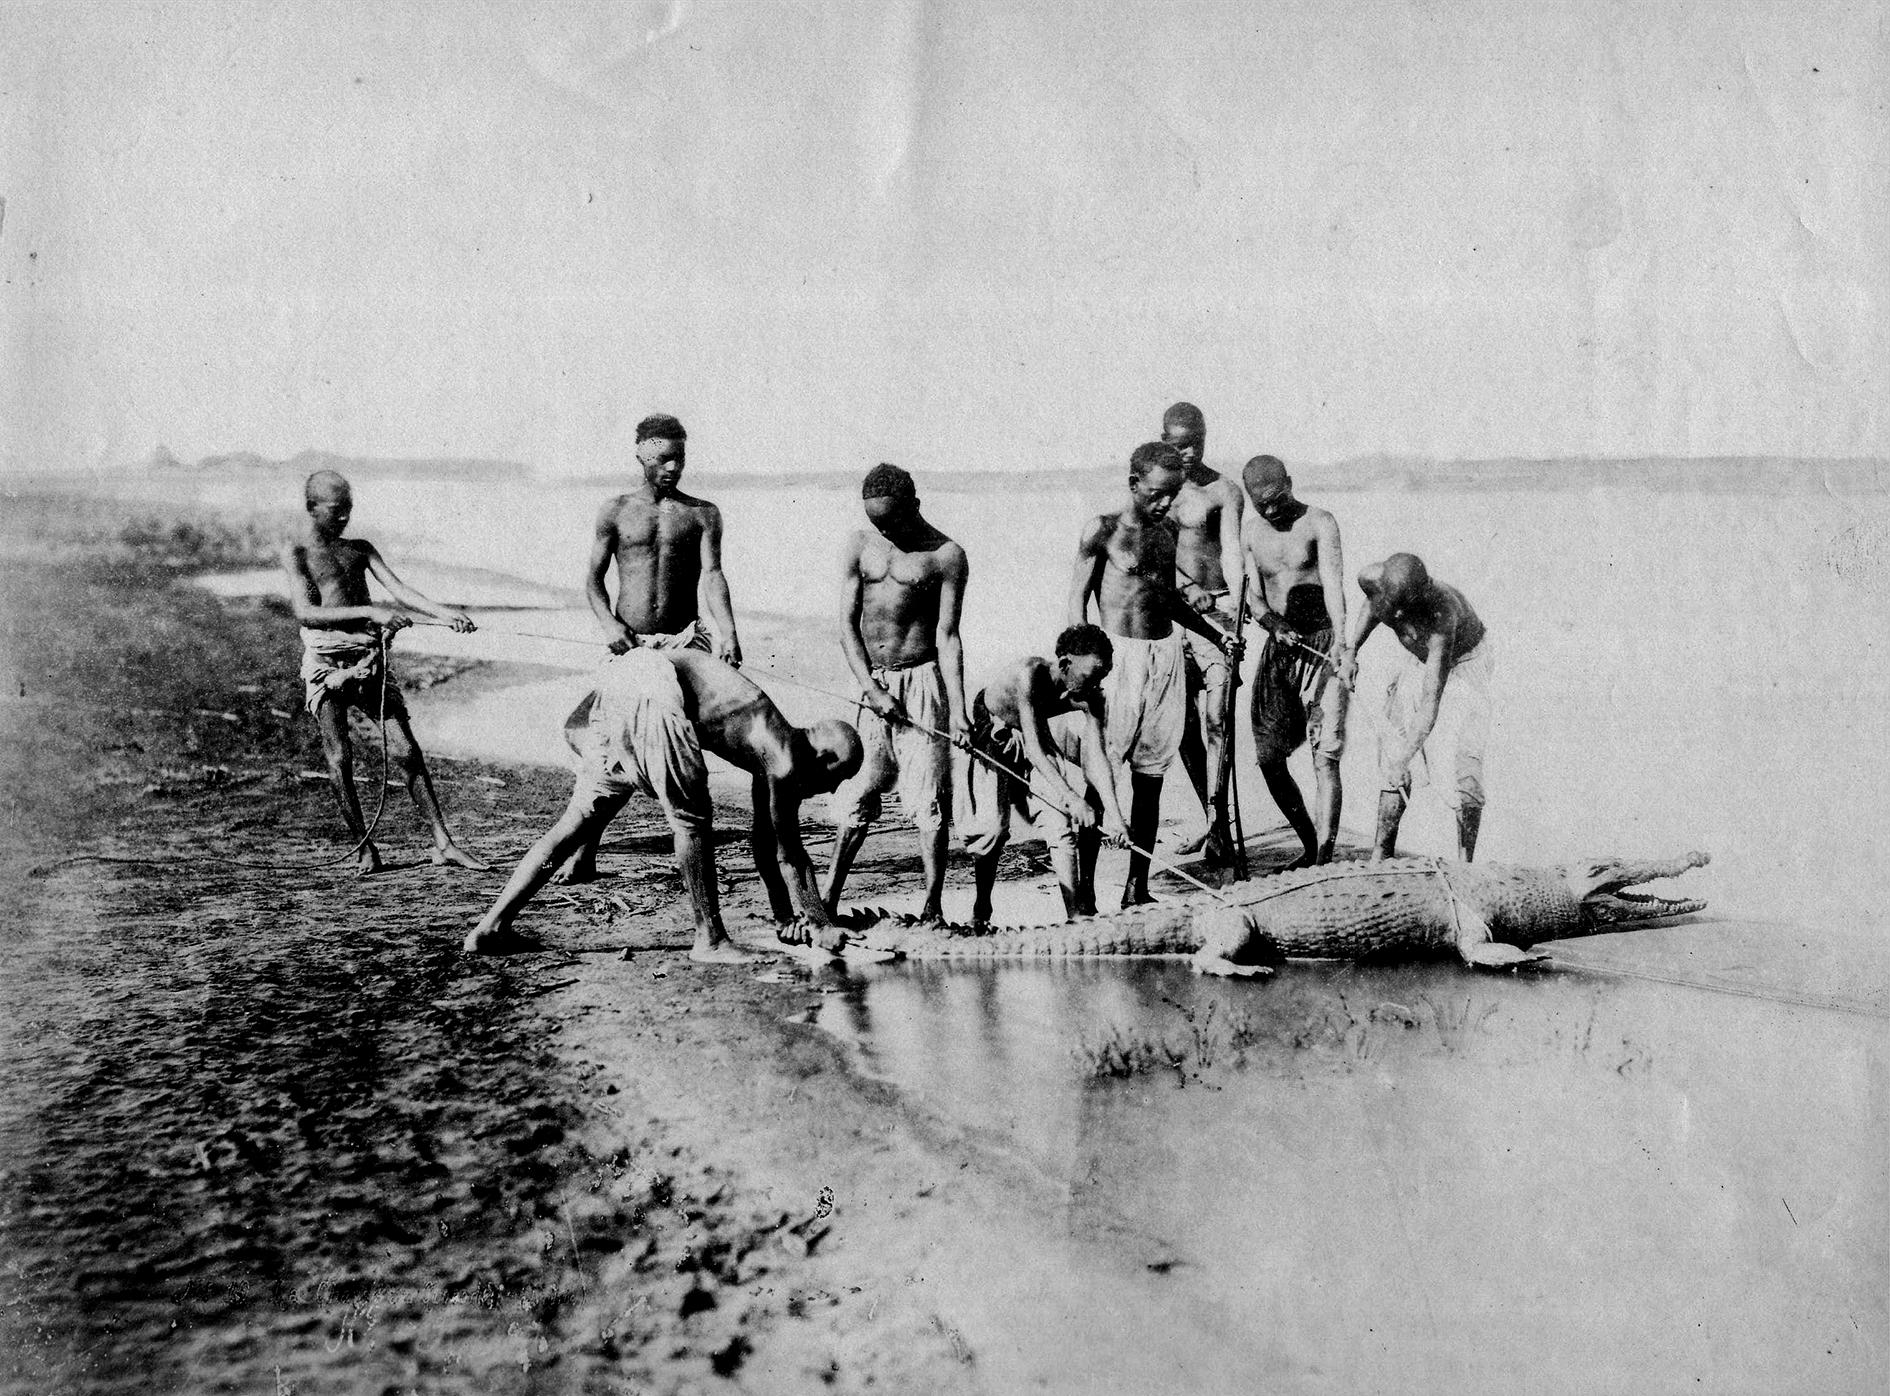 13sobre 518 Bechard chase crocodrile Nubie 1875 25,5x19,5 TARJETON-CATALOGO